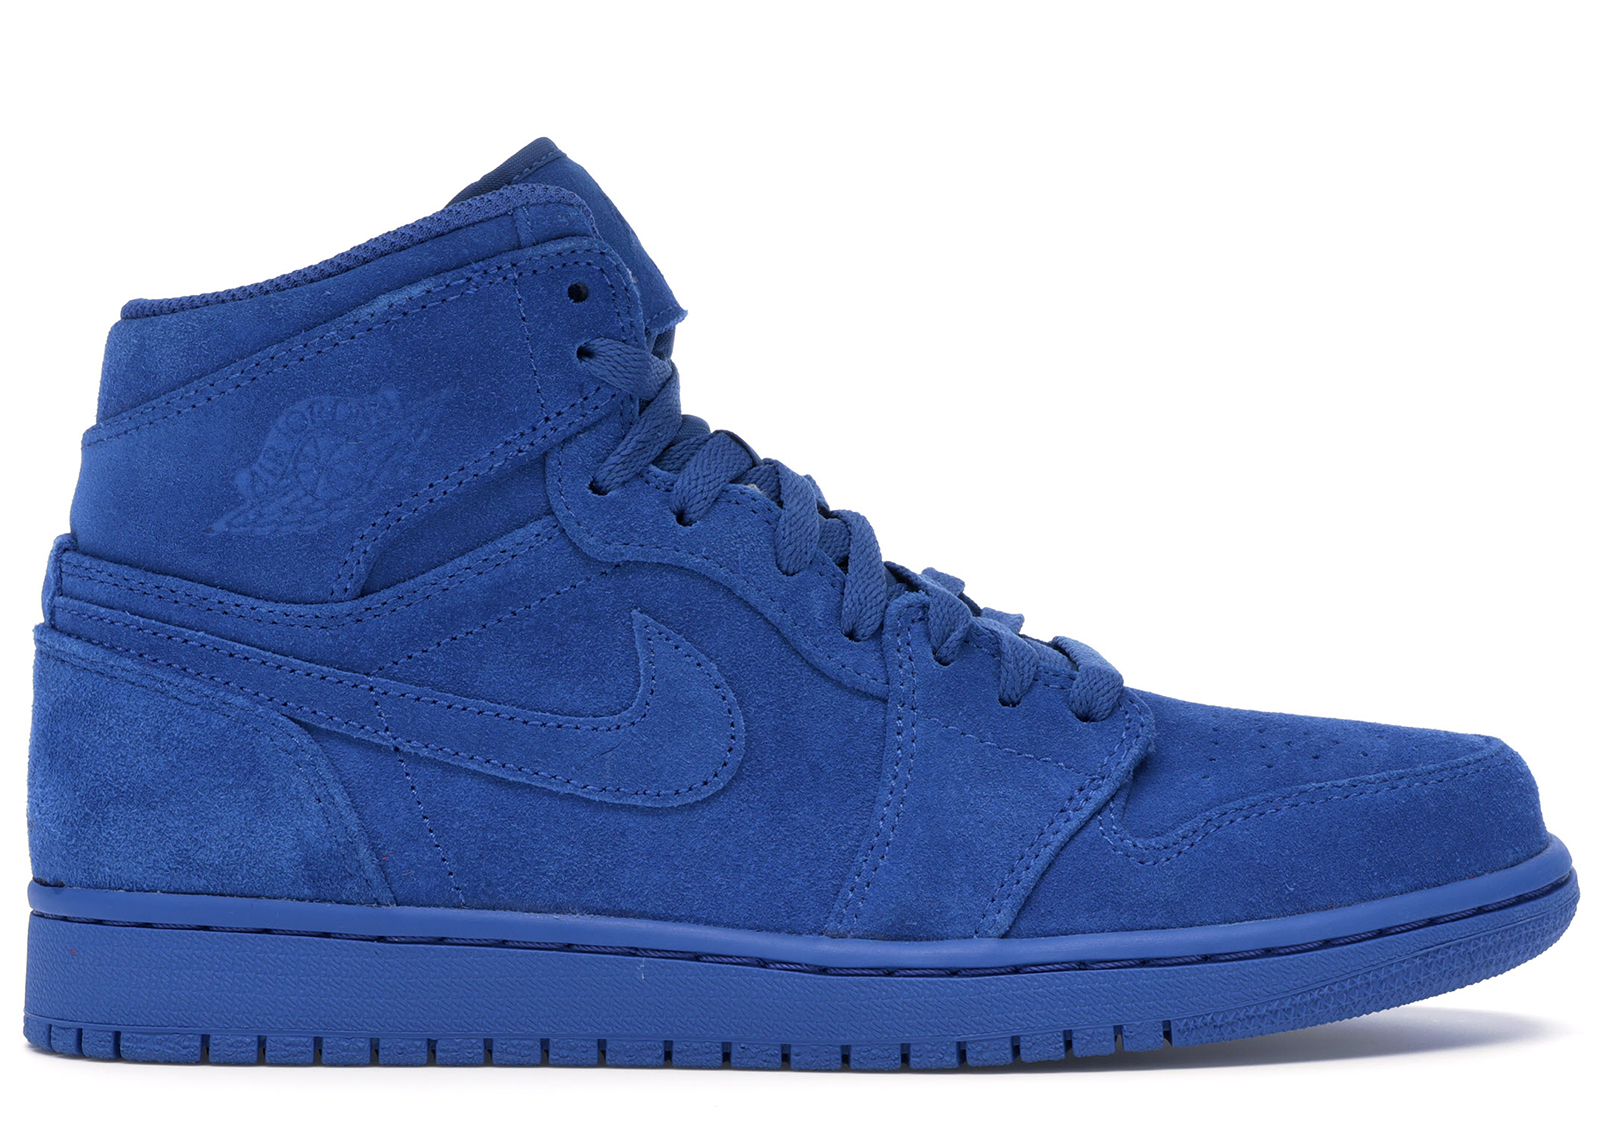 Jordan 1 Retro Blue Suede - 332550-404